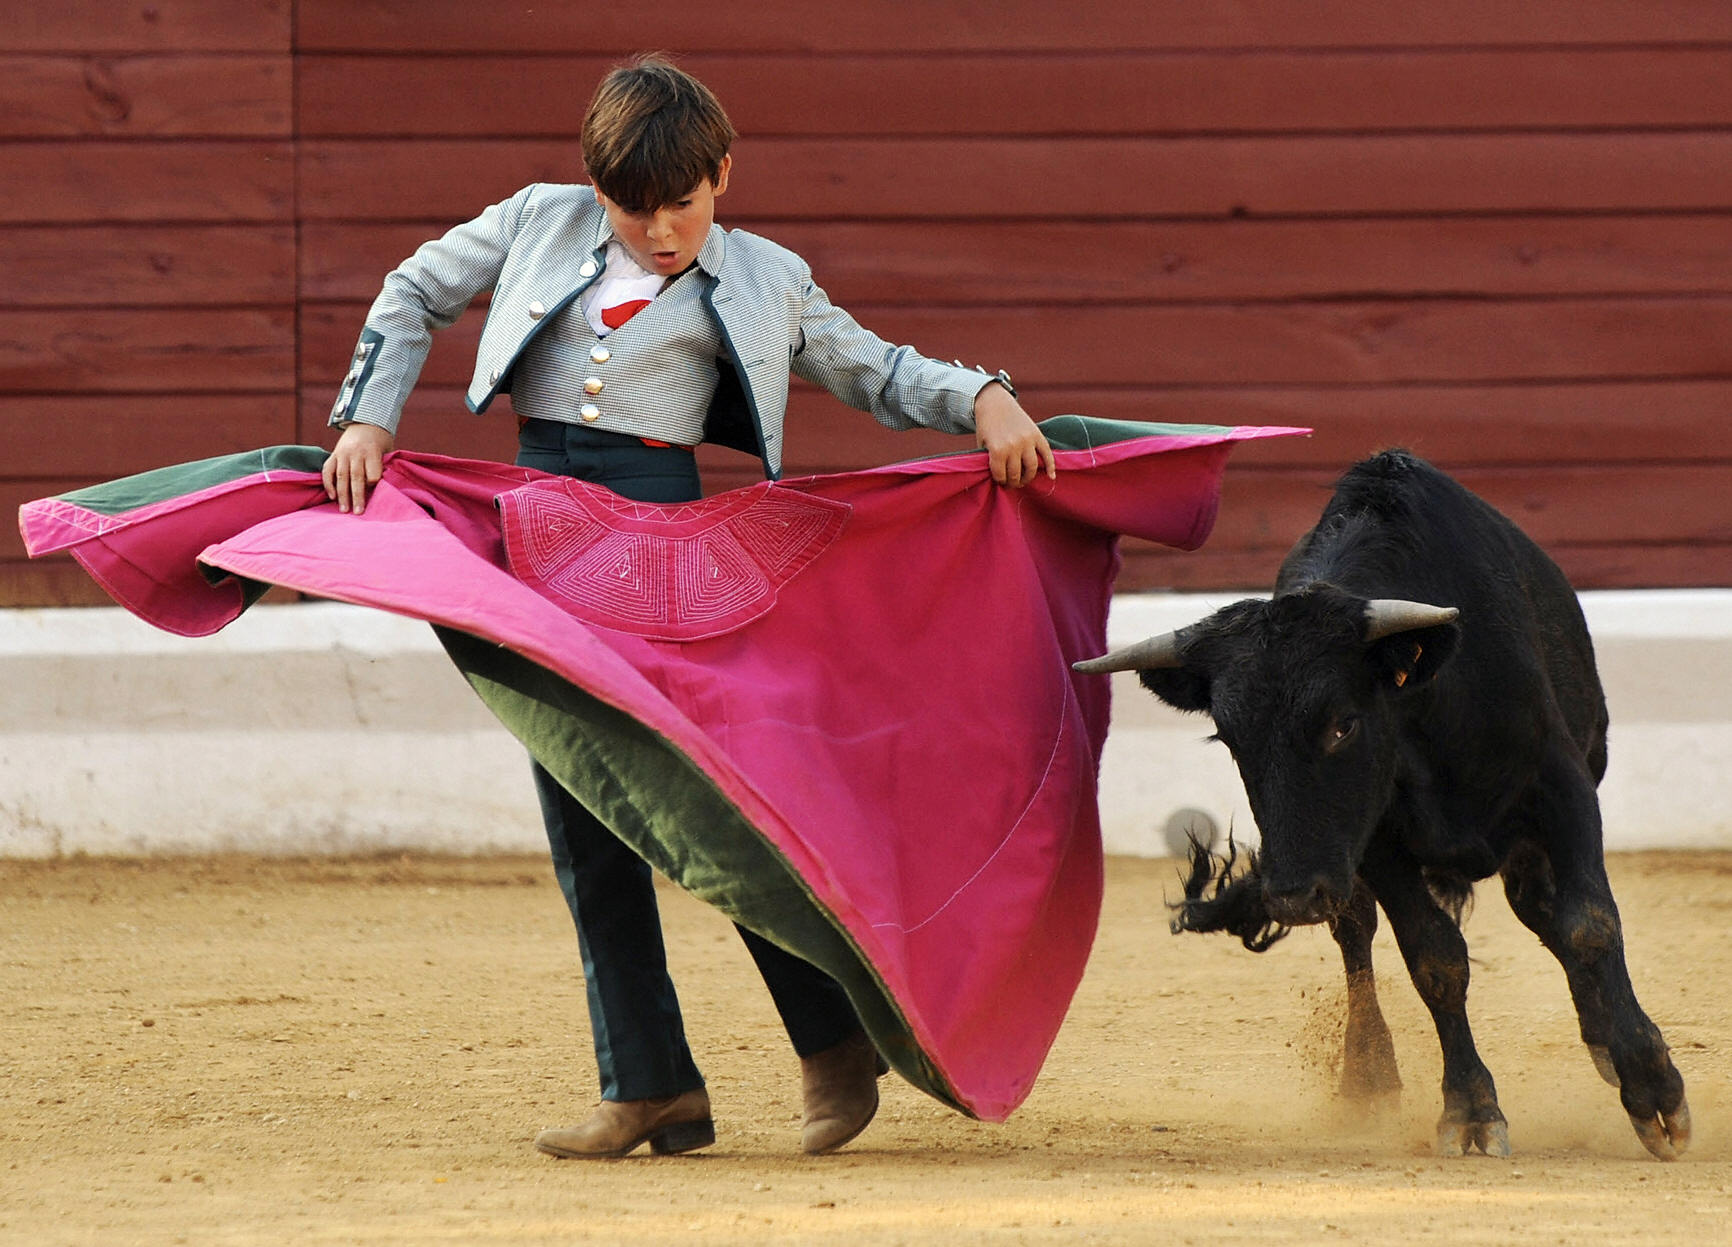 'Cowardly' Bullfighter Amateurs Criticized for Taking on Calves